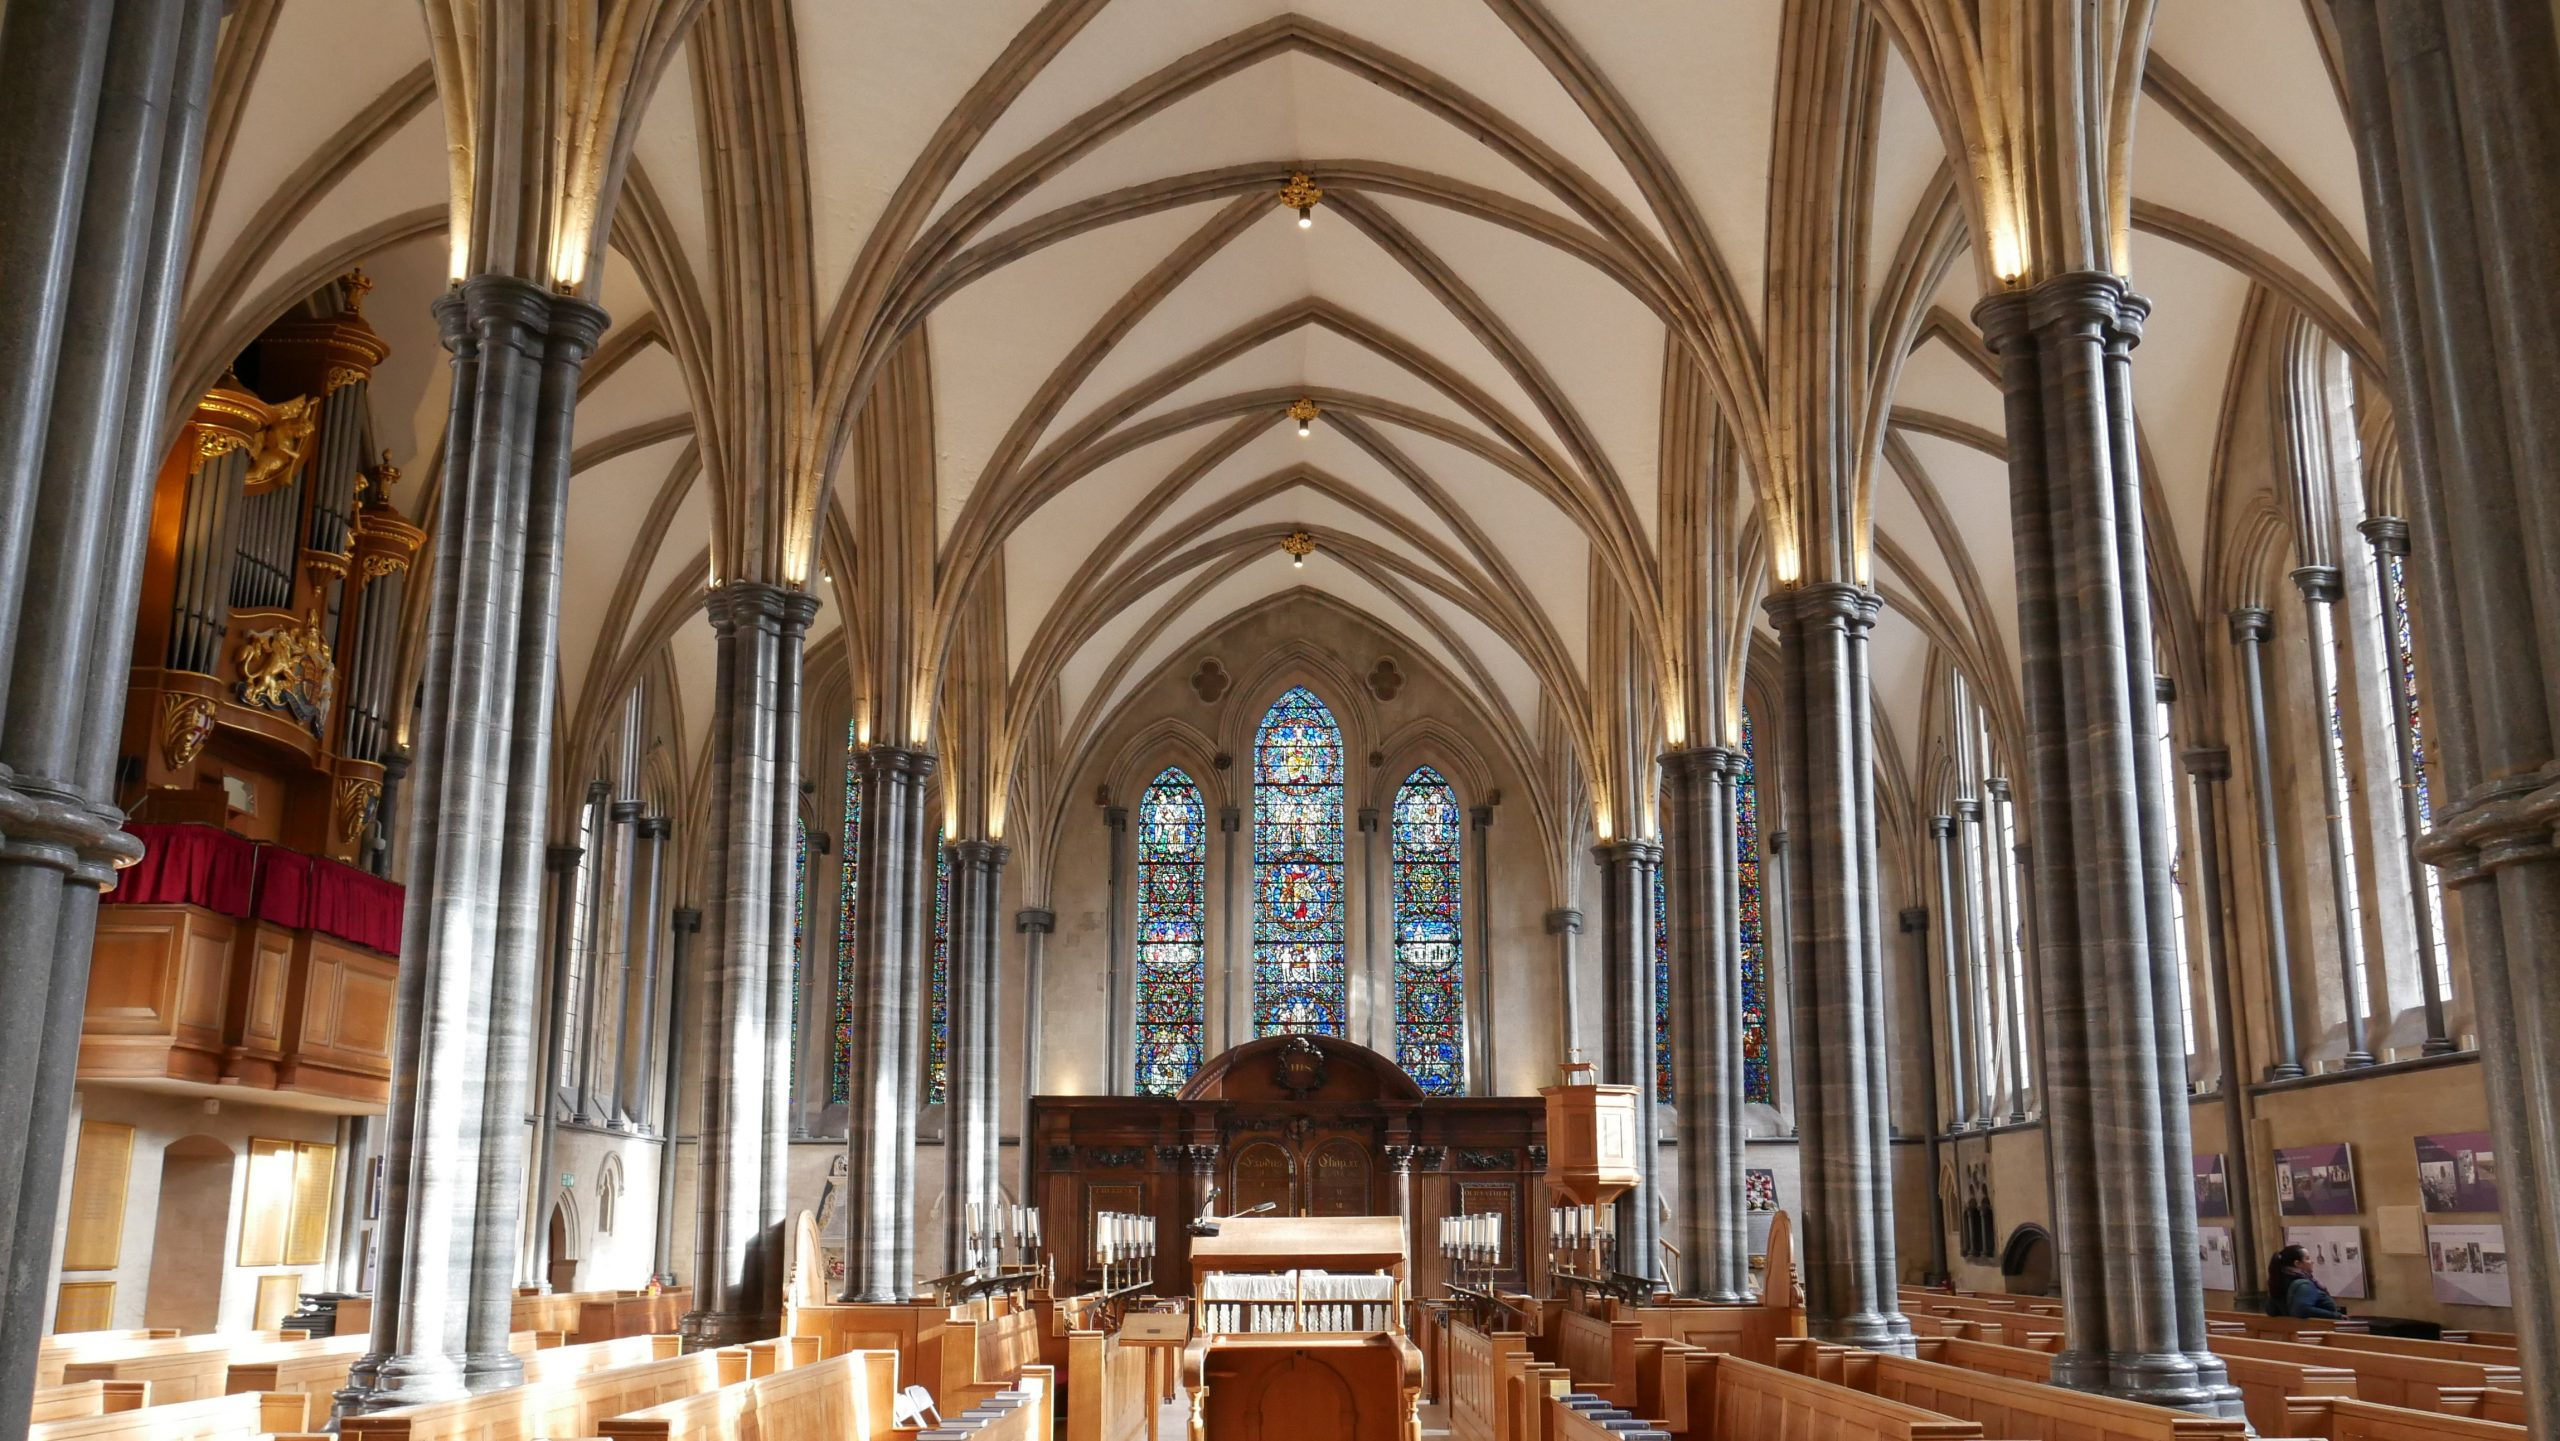 Temple Church London interior view of Chancel